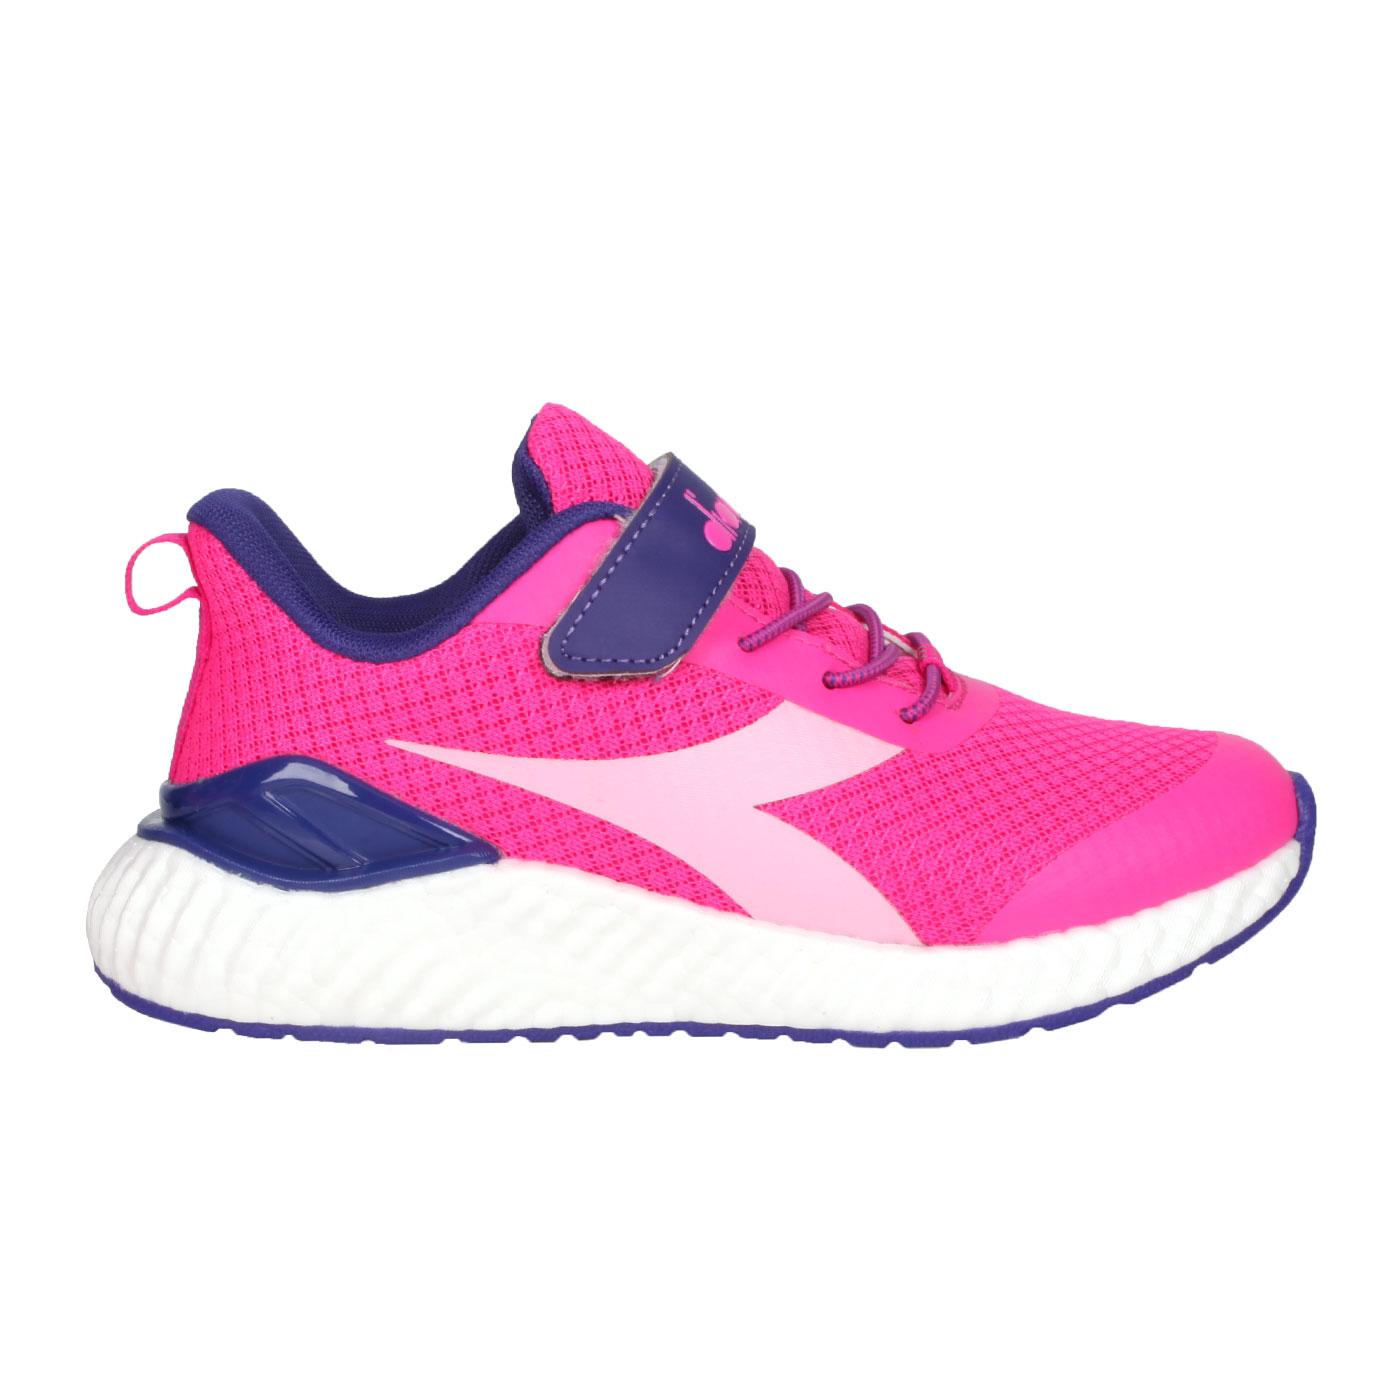 DIADORA 中童慢跑鞋-超寬楦 DA13015 - 桃紅紫